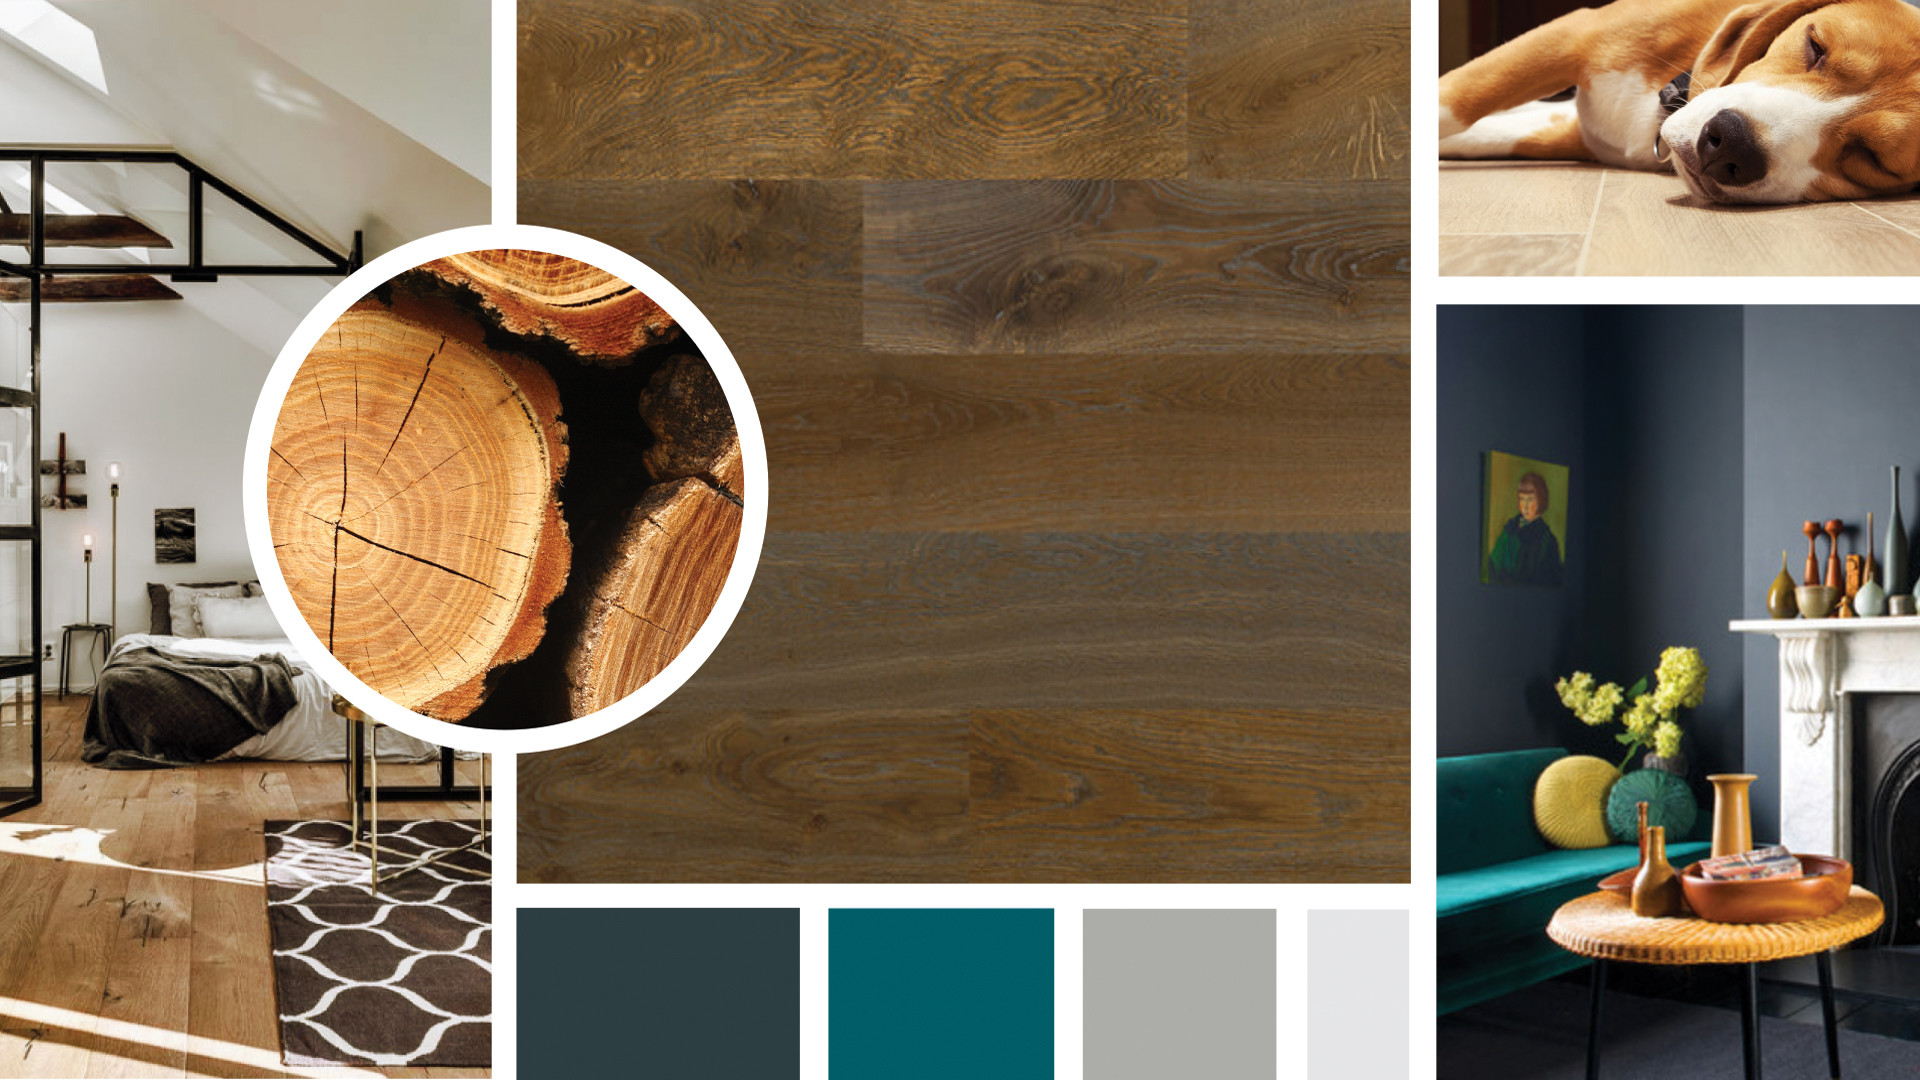 4 1 4 hardwood flooring of 4 latest hardwood flooring trends of 2018 lauzon flooring with regard to new hardwood floorings